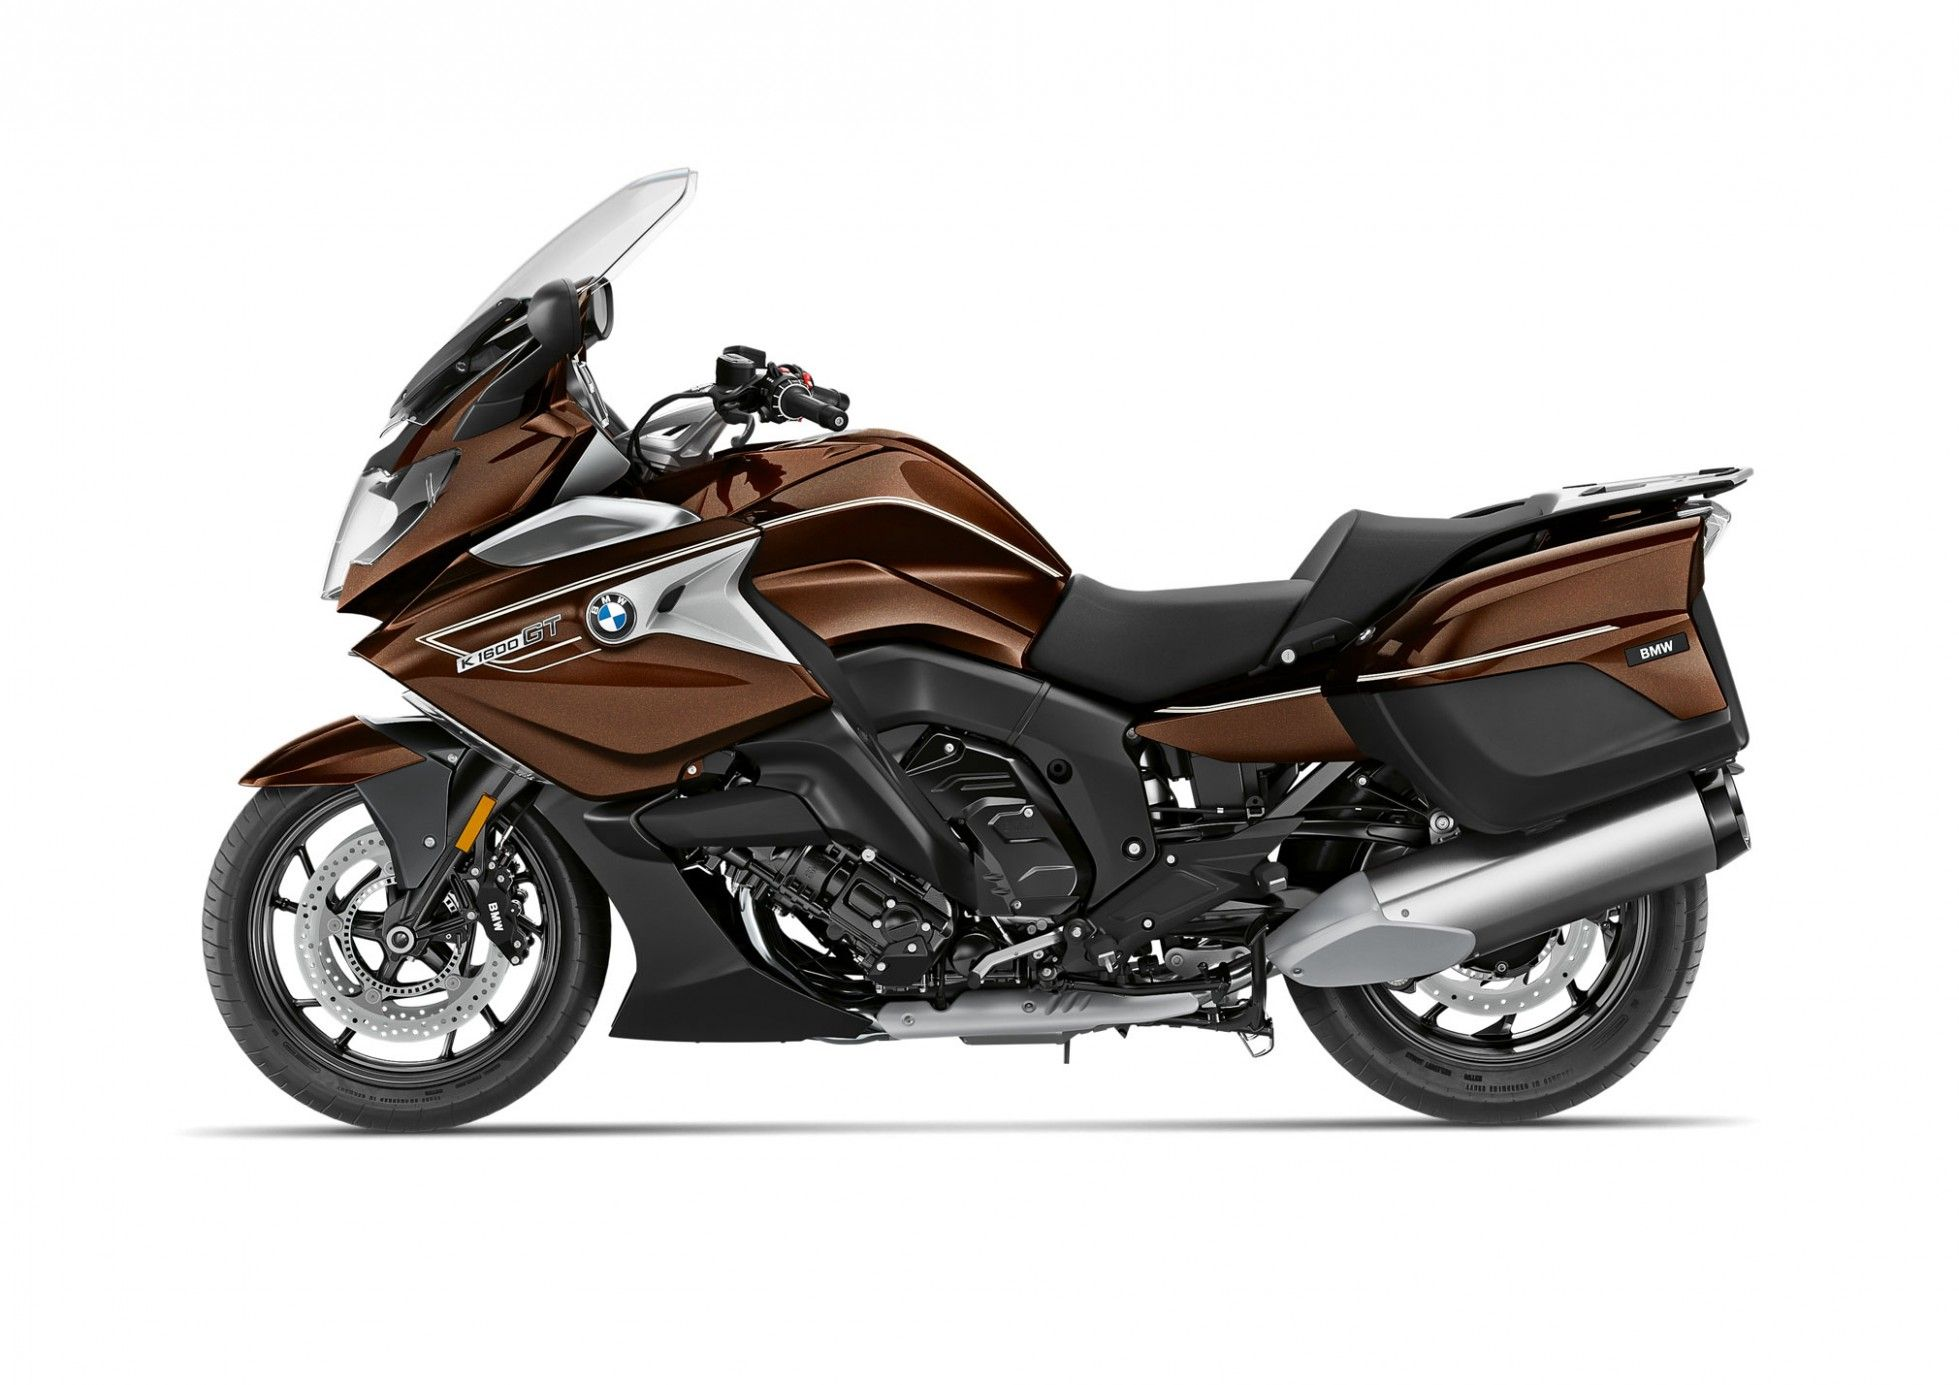 Bmw K 1600 B Price Specs Mileage Colours Photos And Reviews In 2020 Bmw Bmw Motorrad Sports Car